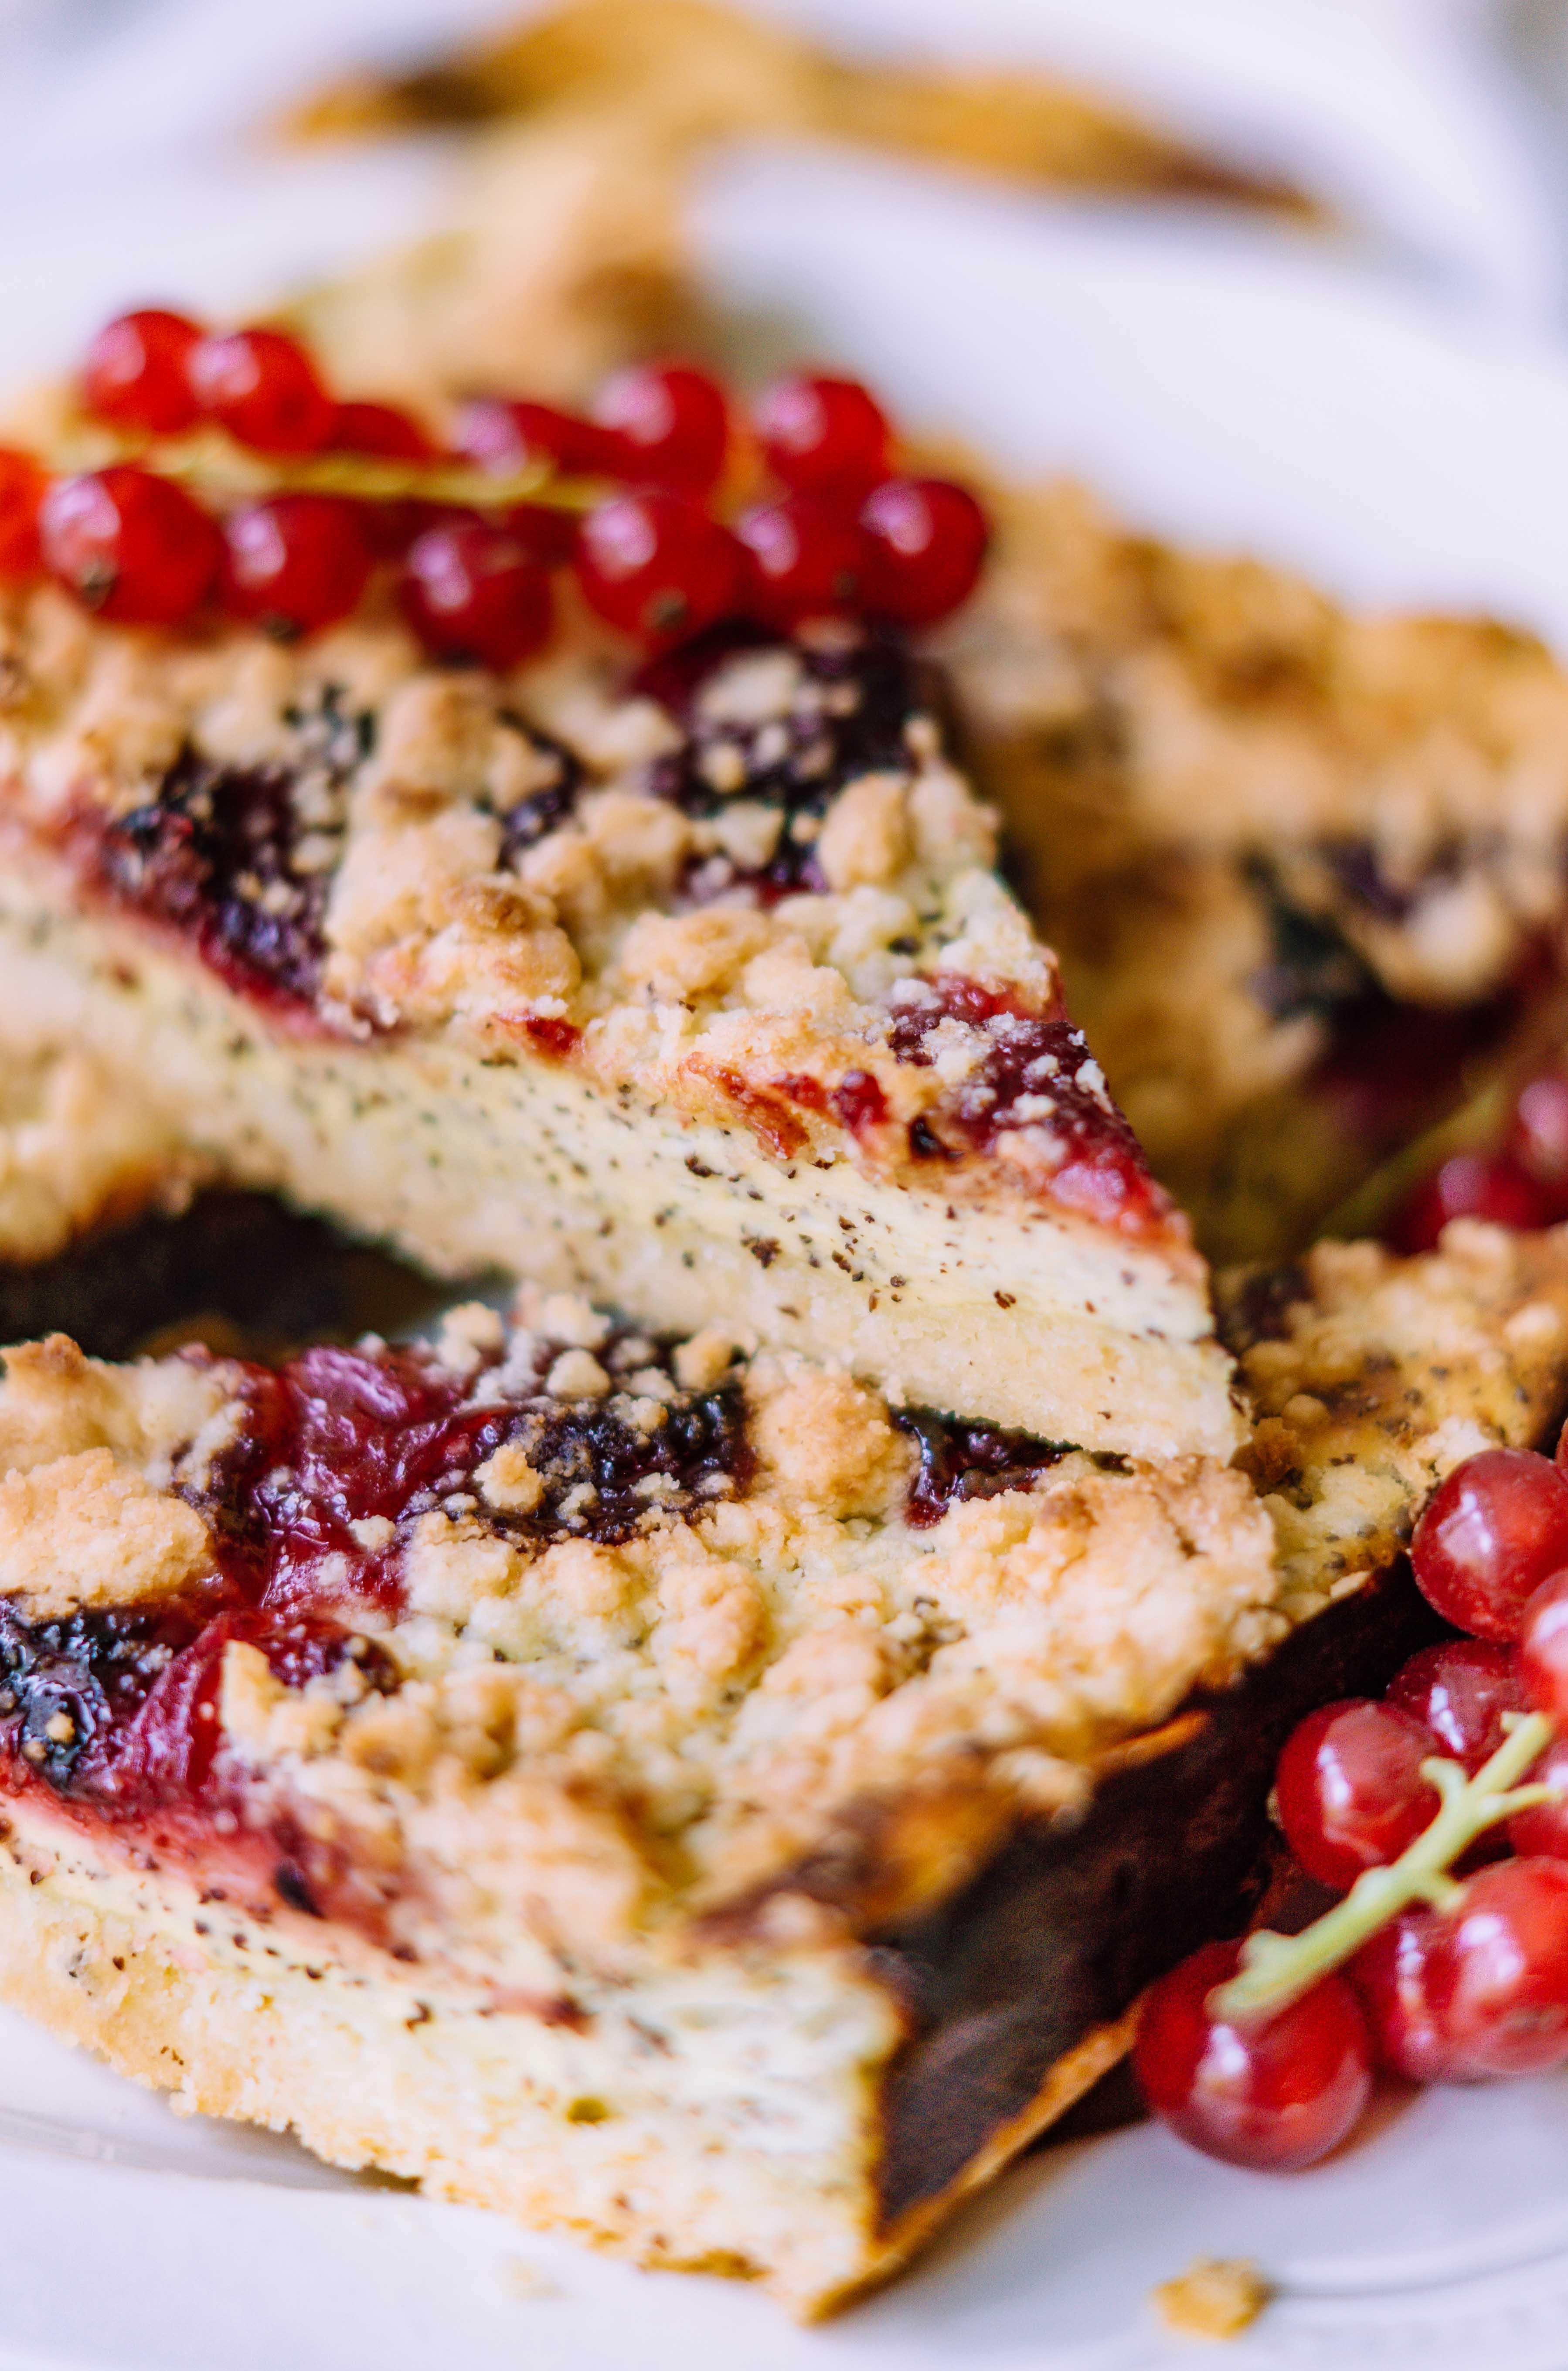 Poppy Seed Cheesecake